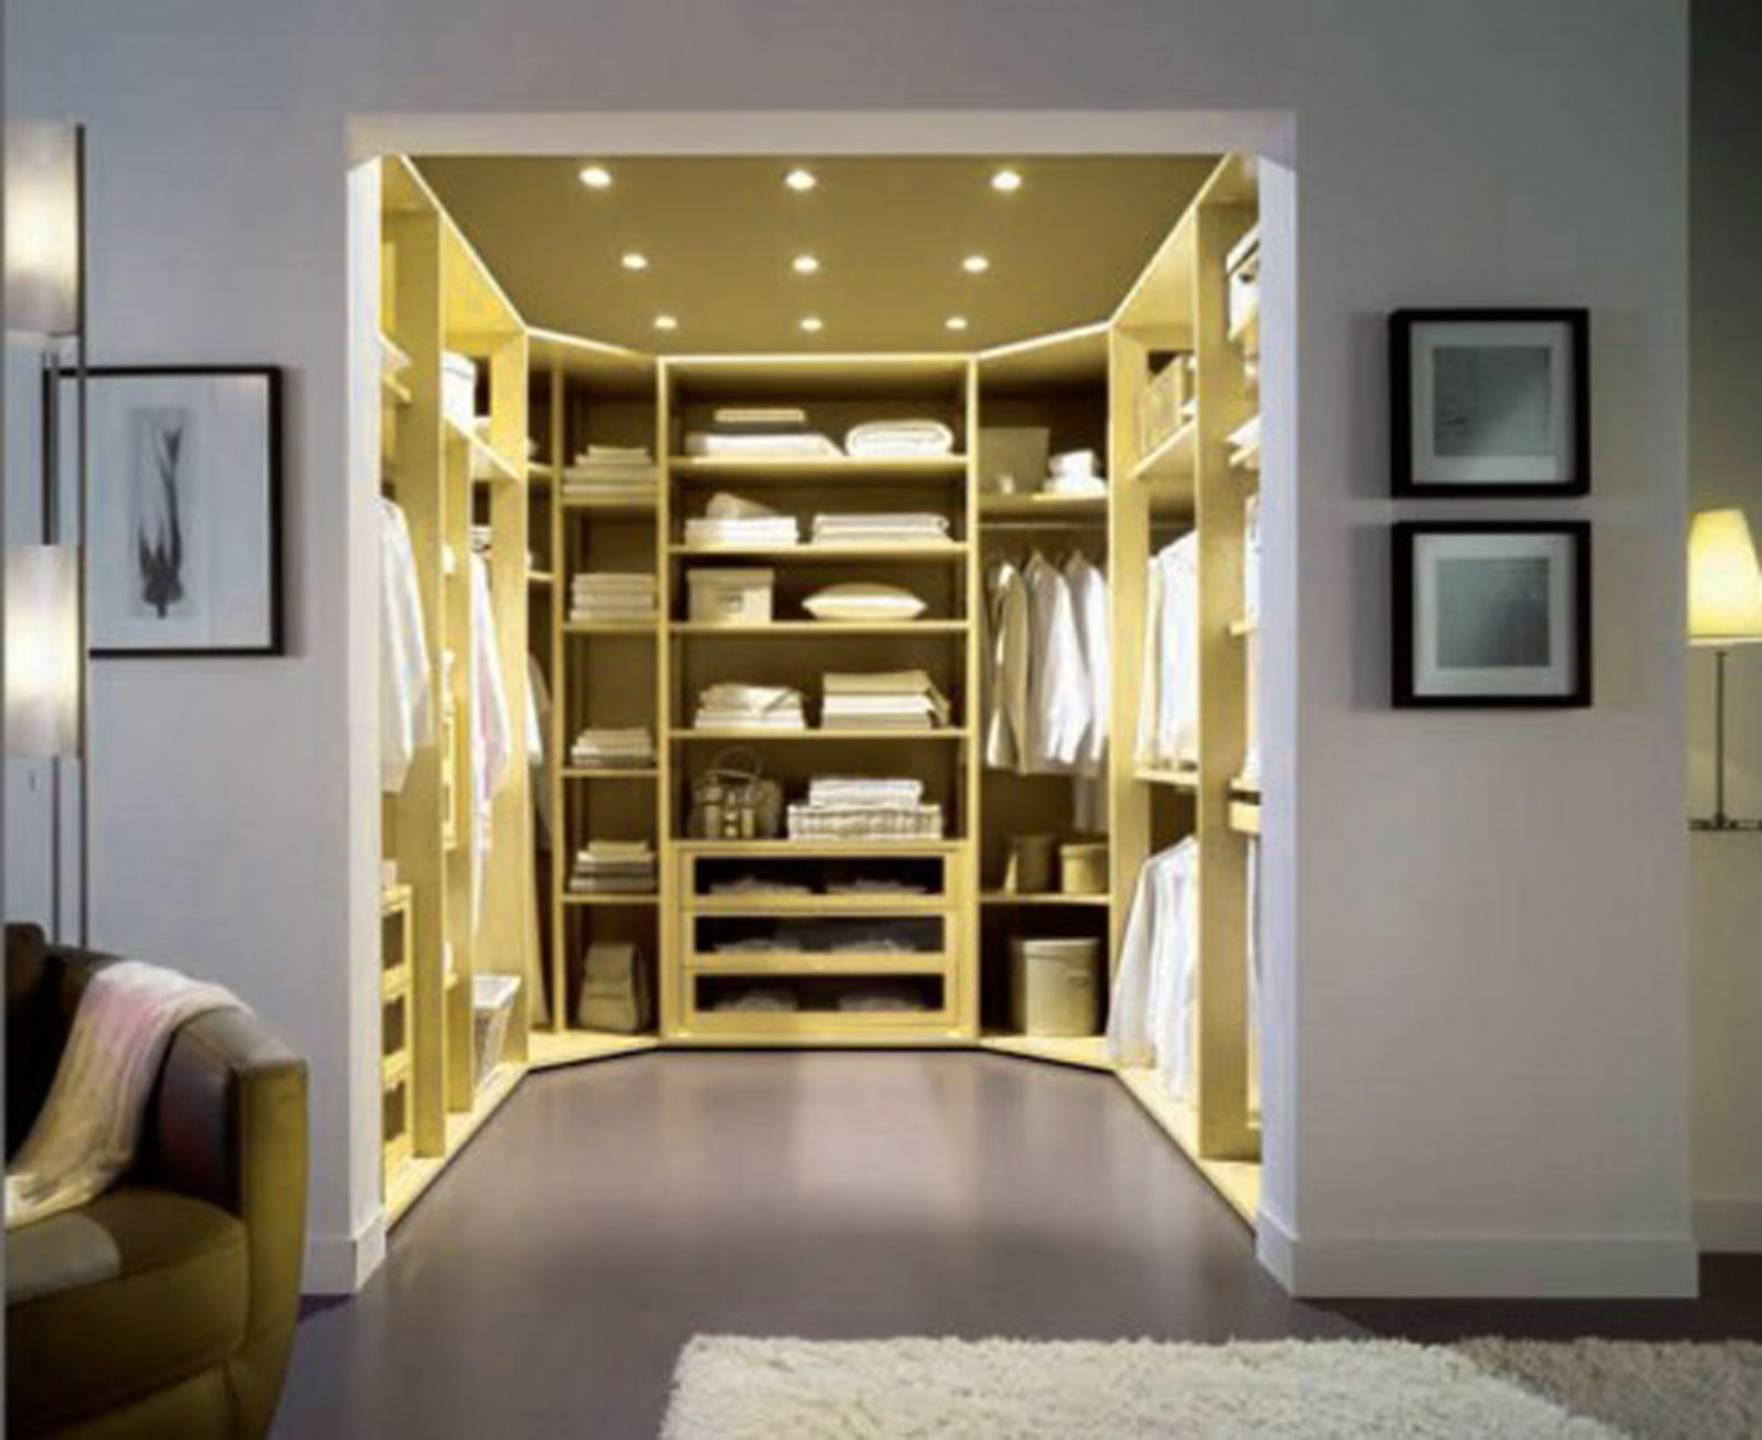 Image of: Walk Closet Traditional Modern Interior Design Small House Plans 37703